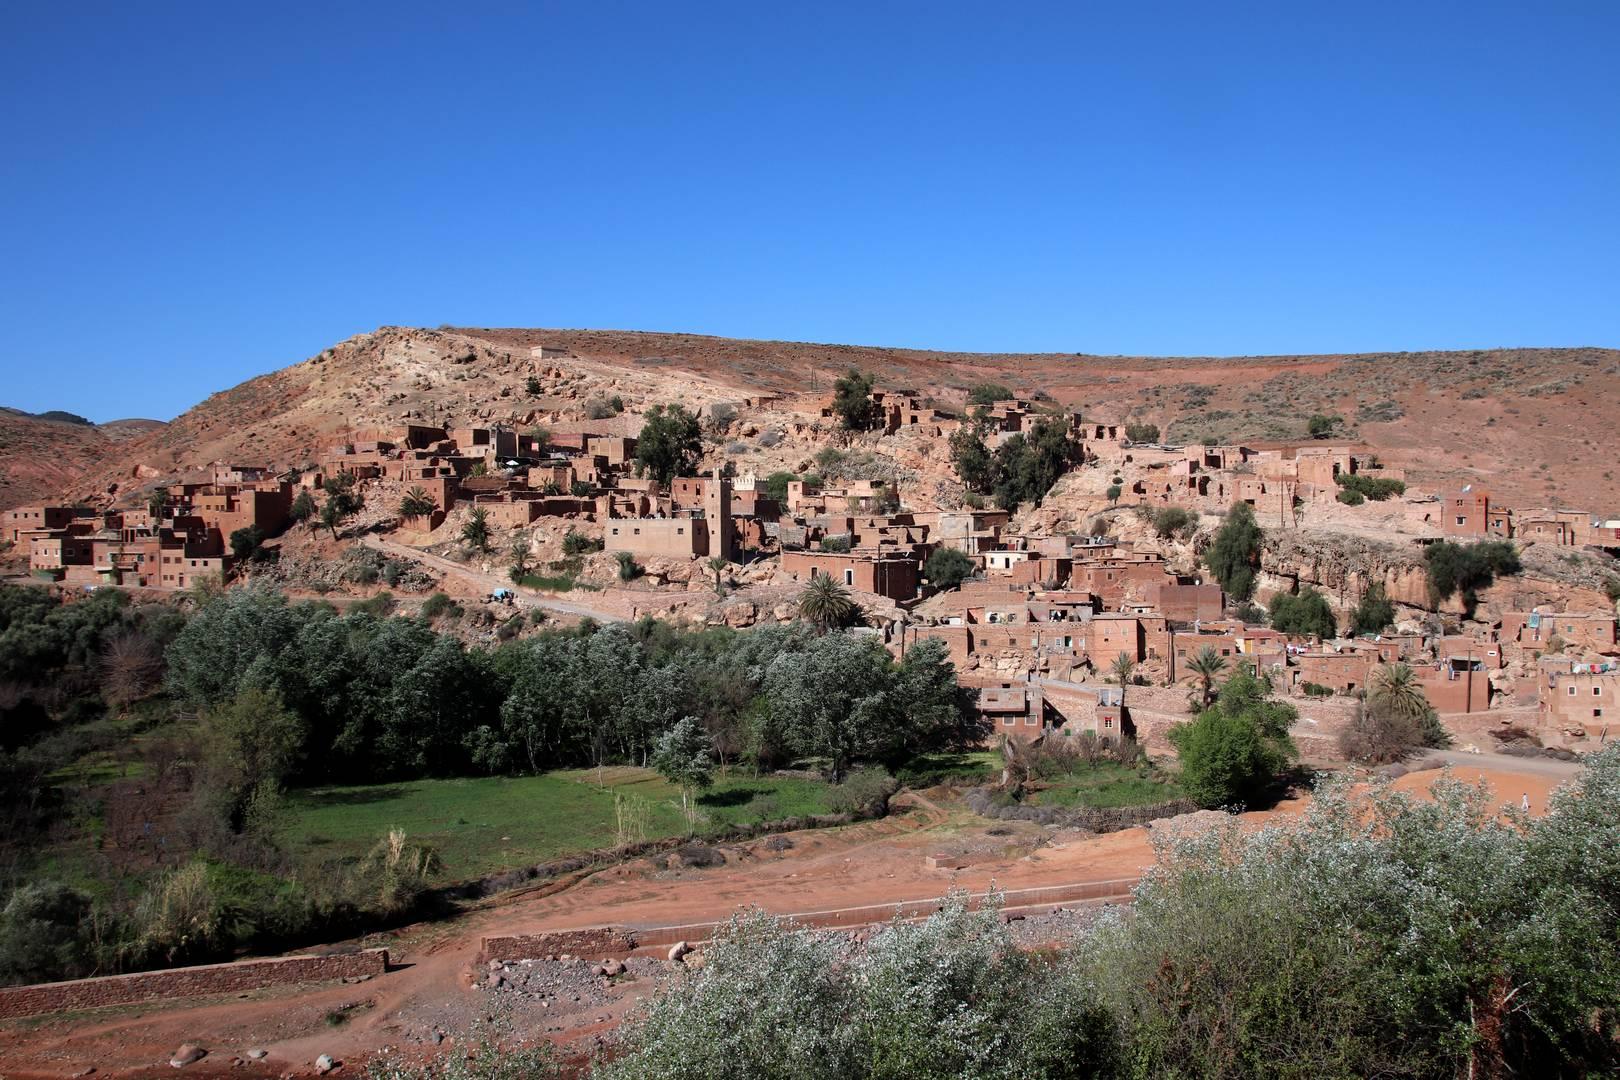 Maroc - Village dans la vallée d'Imlil